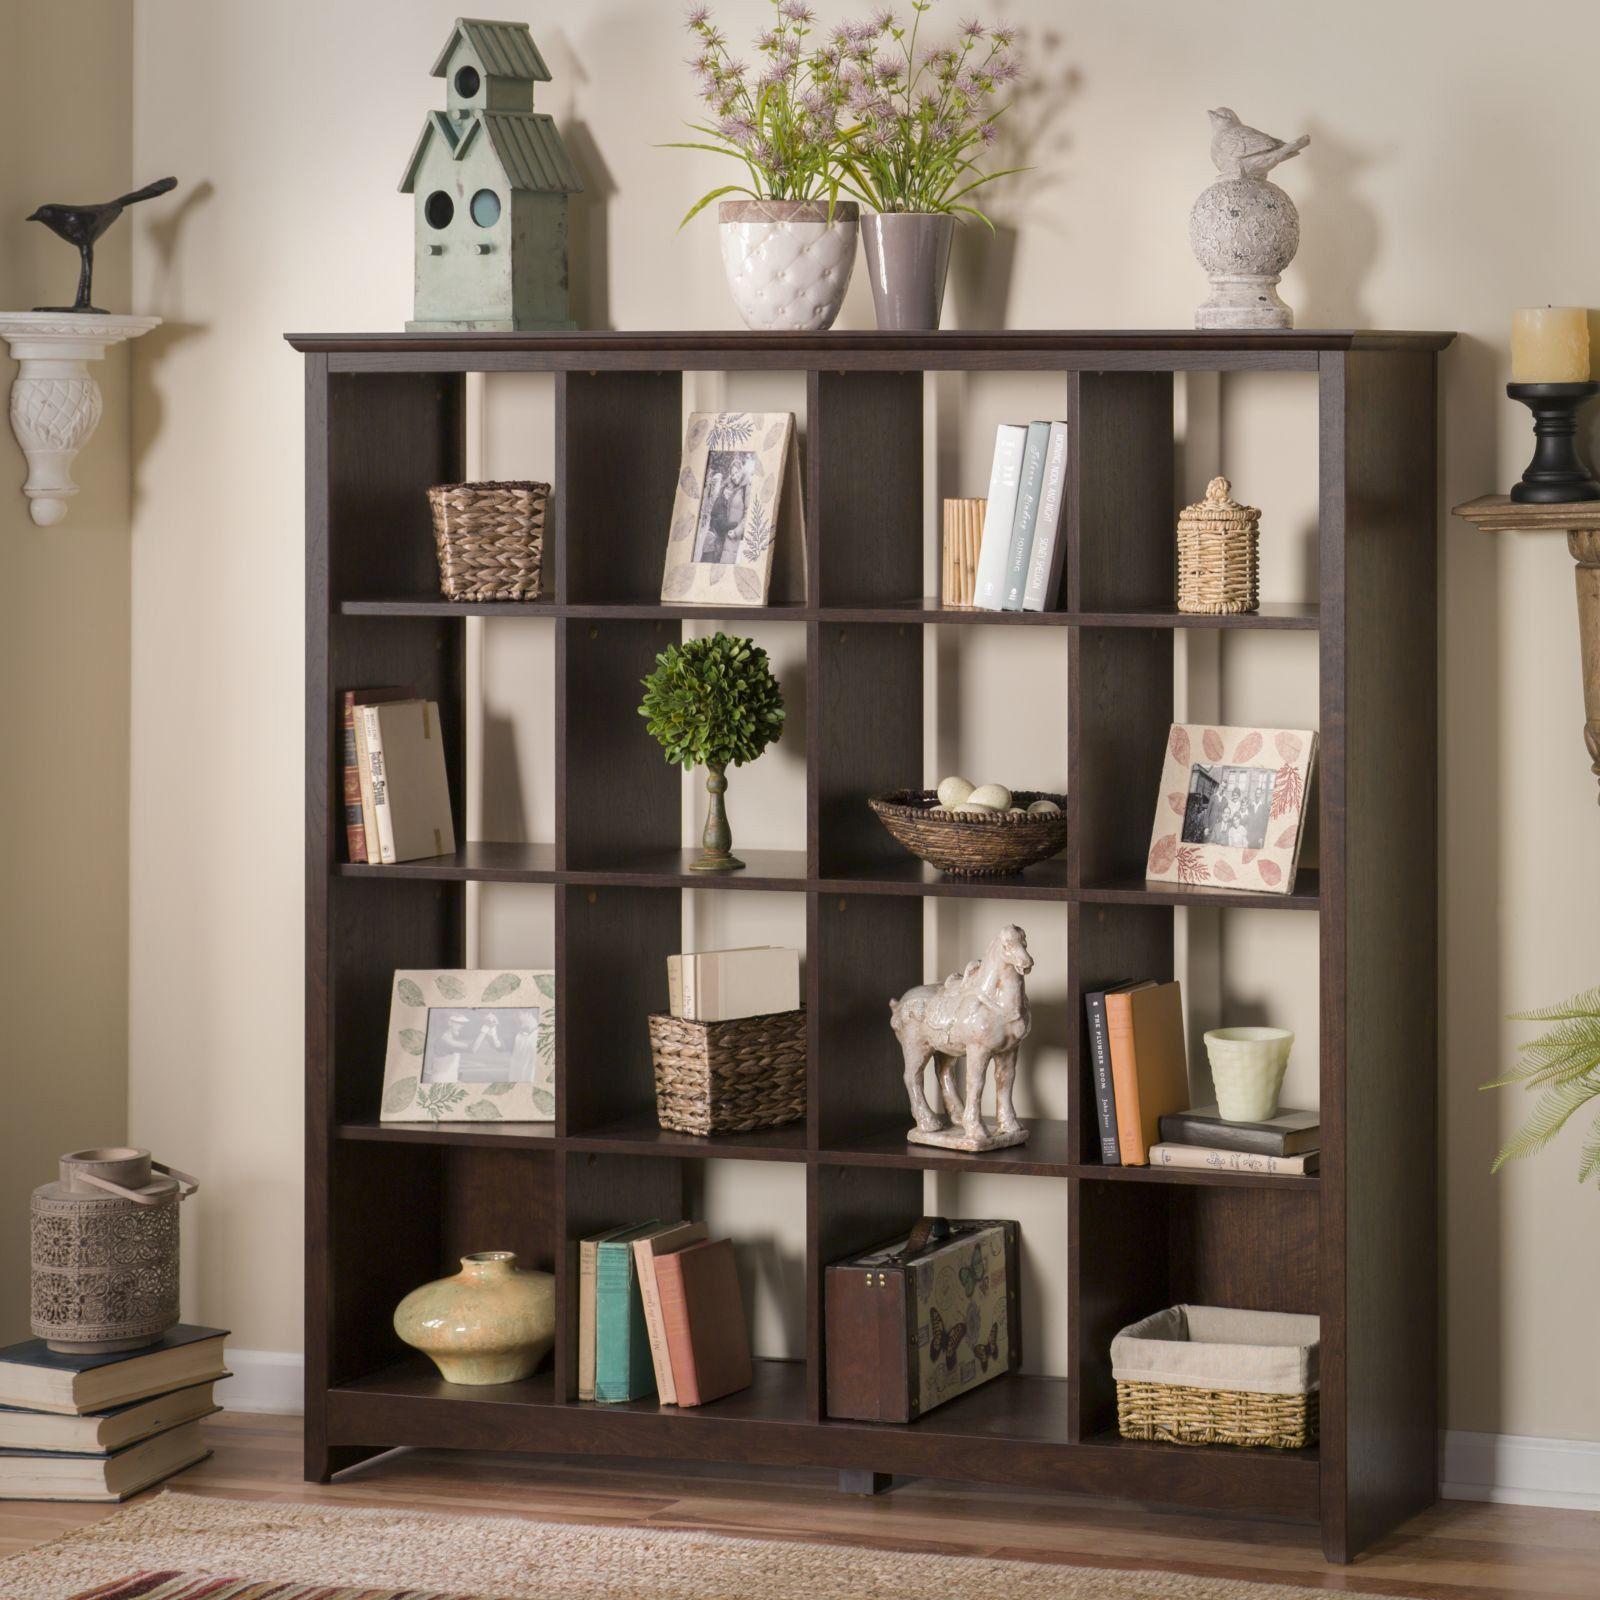 Bookshelf Decorating Ideas Cube Storageoffice